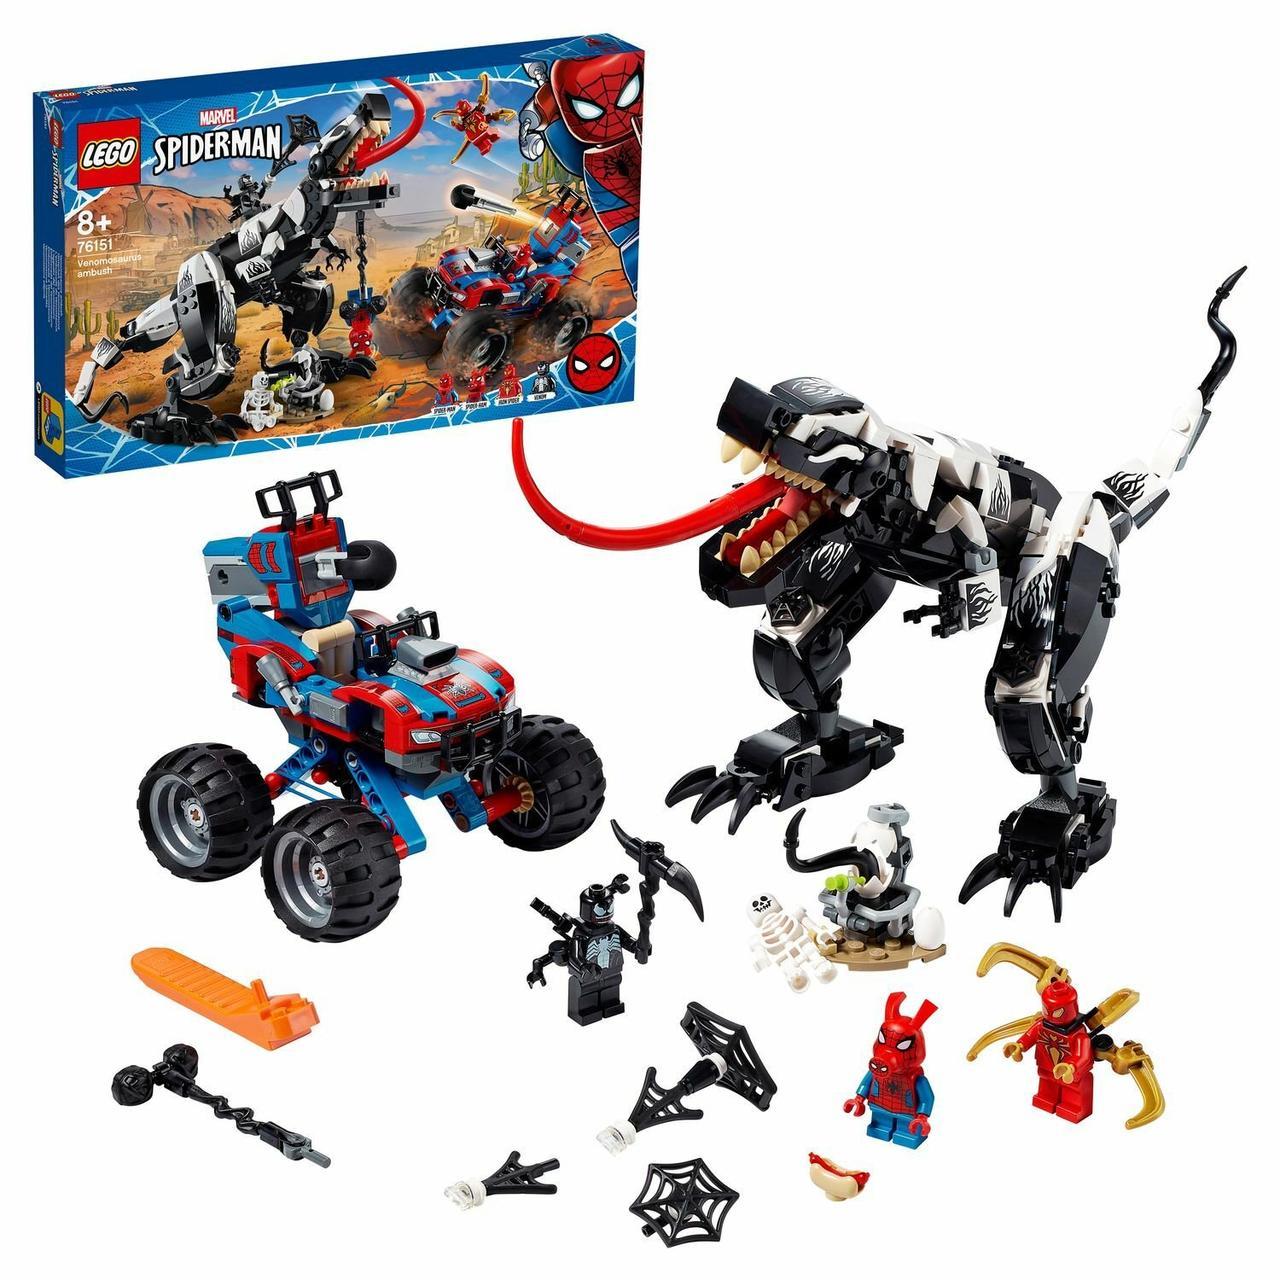 Конструктор LEGO: Человек-Паук: Засада на веномозавра